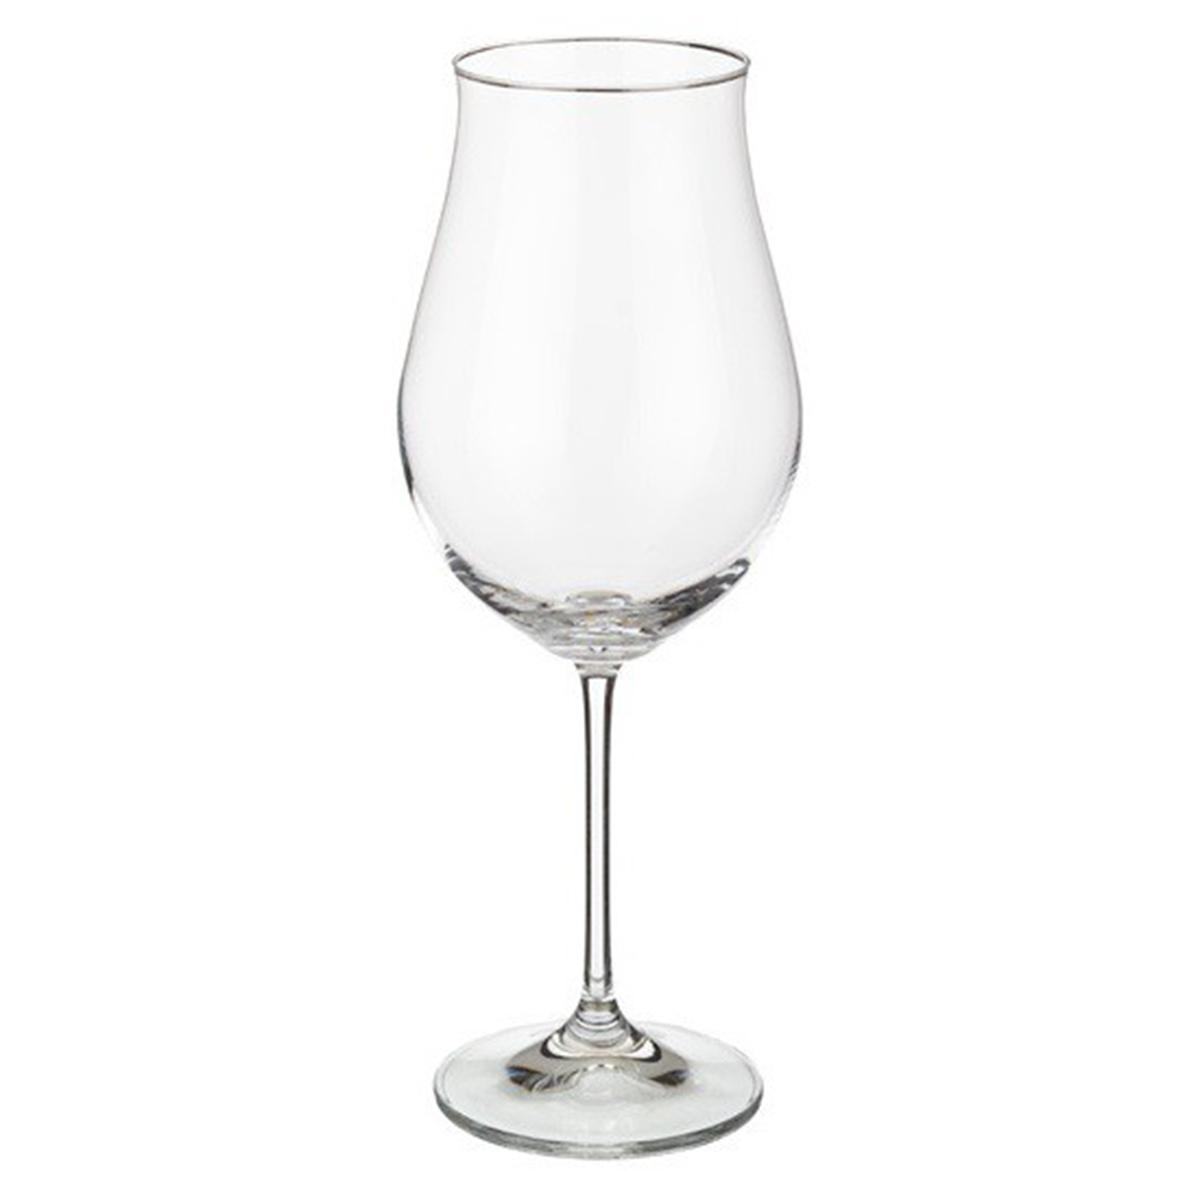 Набор бокалов для вина Bohemia Crystal Attimo, 500 мл, 6 шт набор бокалов для вина bohemia crystal attimo 500 мл 6 шт